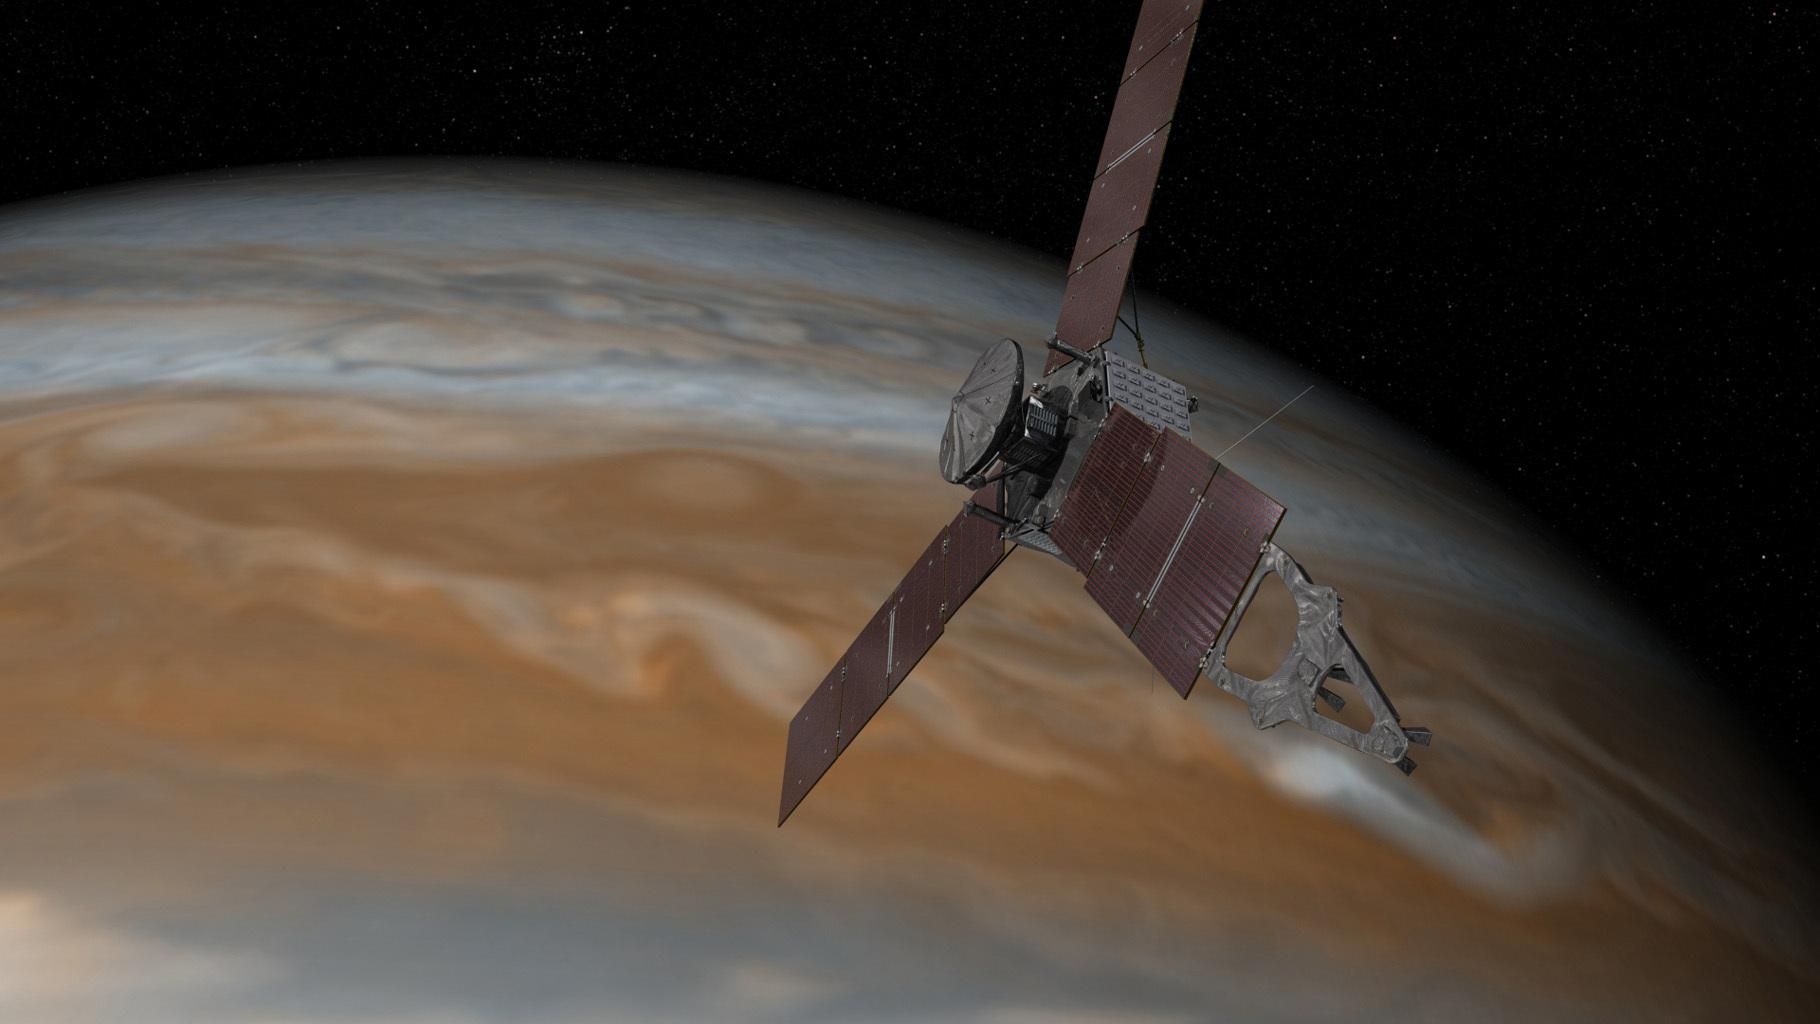 Jupiter spacecraft detects problem, turns off camera